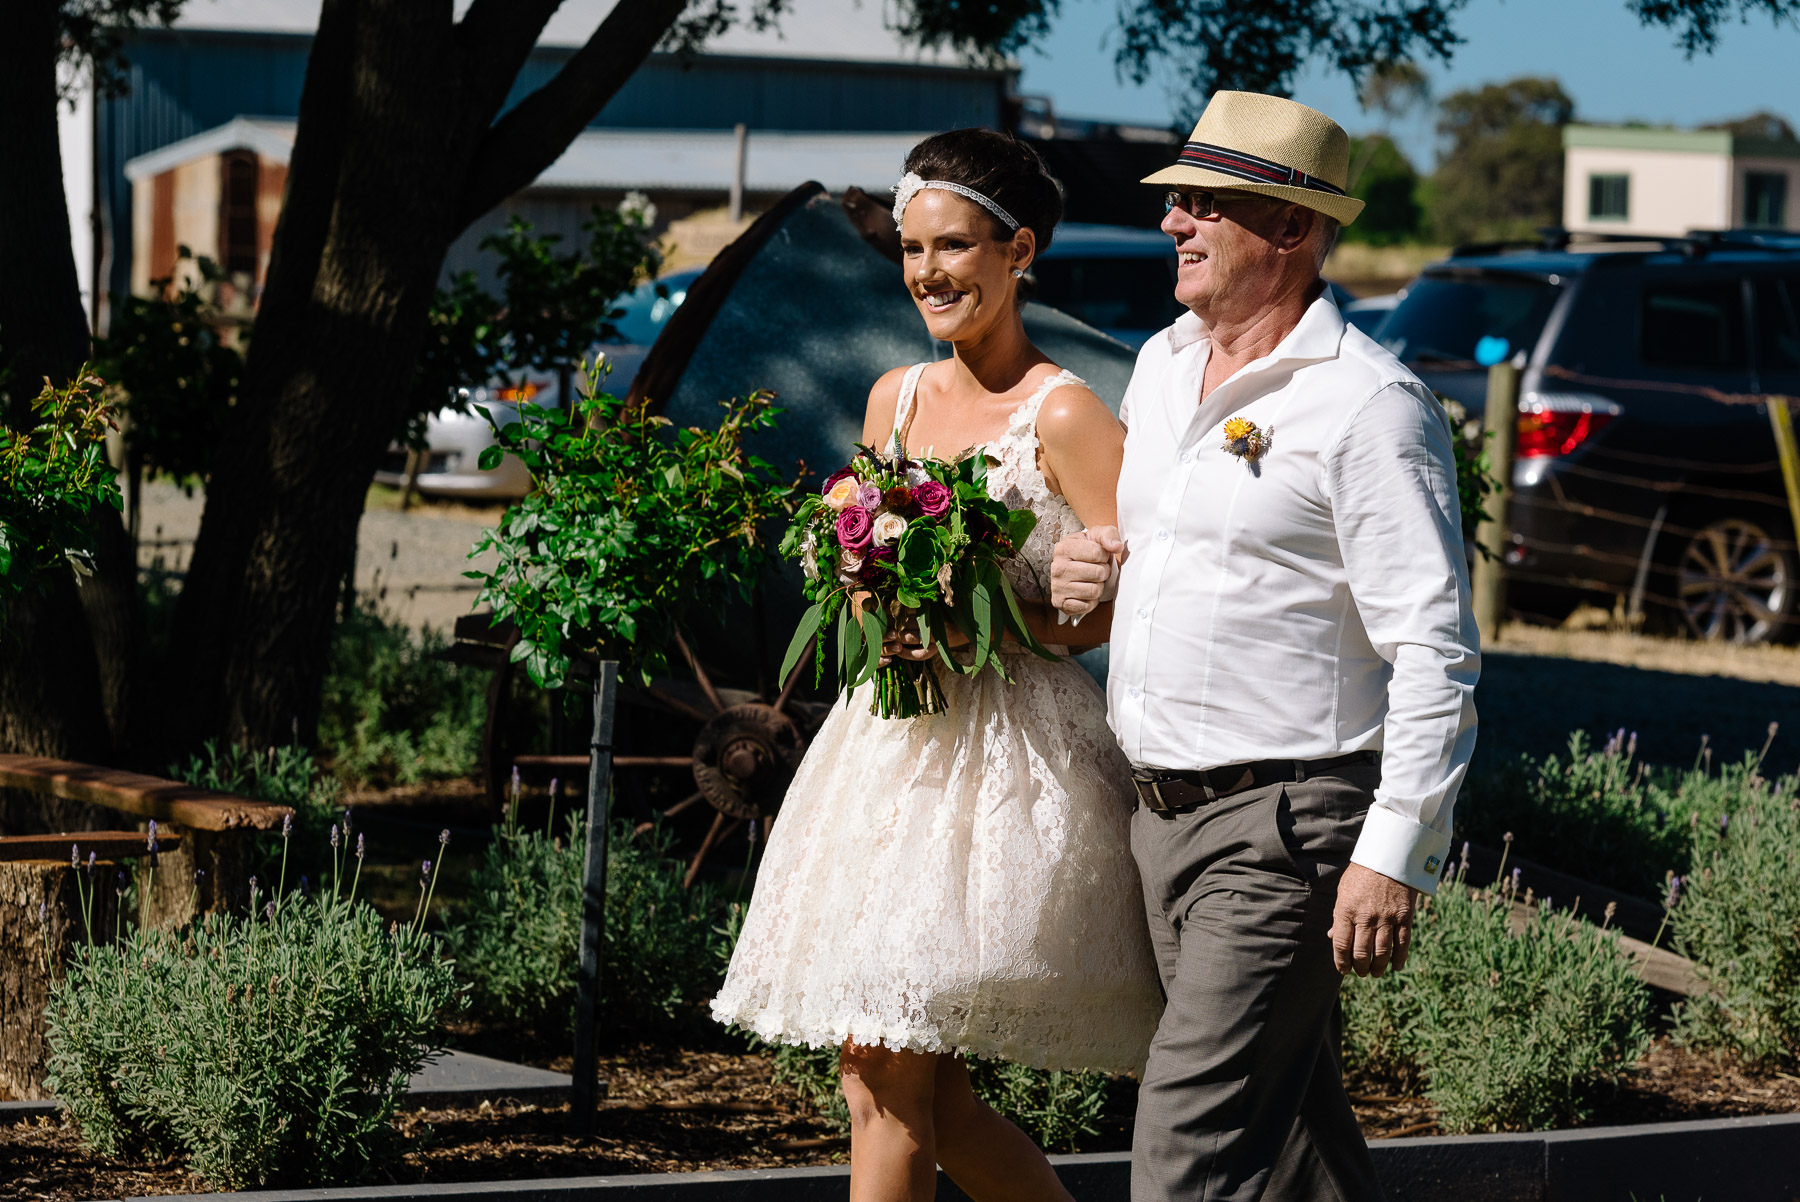 Melissa_and_Kristan_Echuca_Farm_Wedding_New_Years_Eve-56.jpg